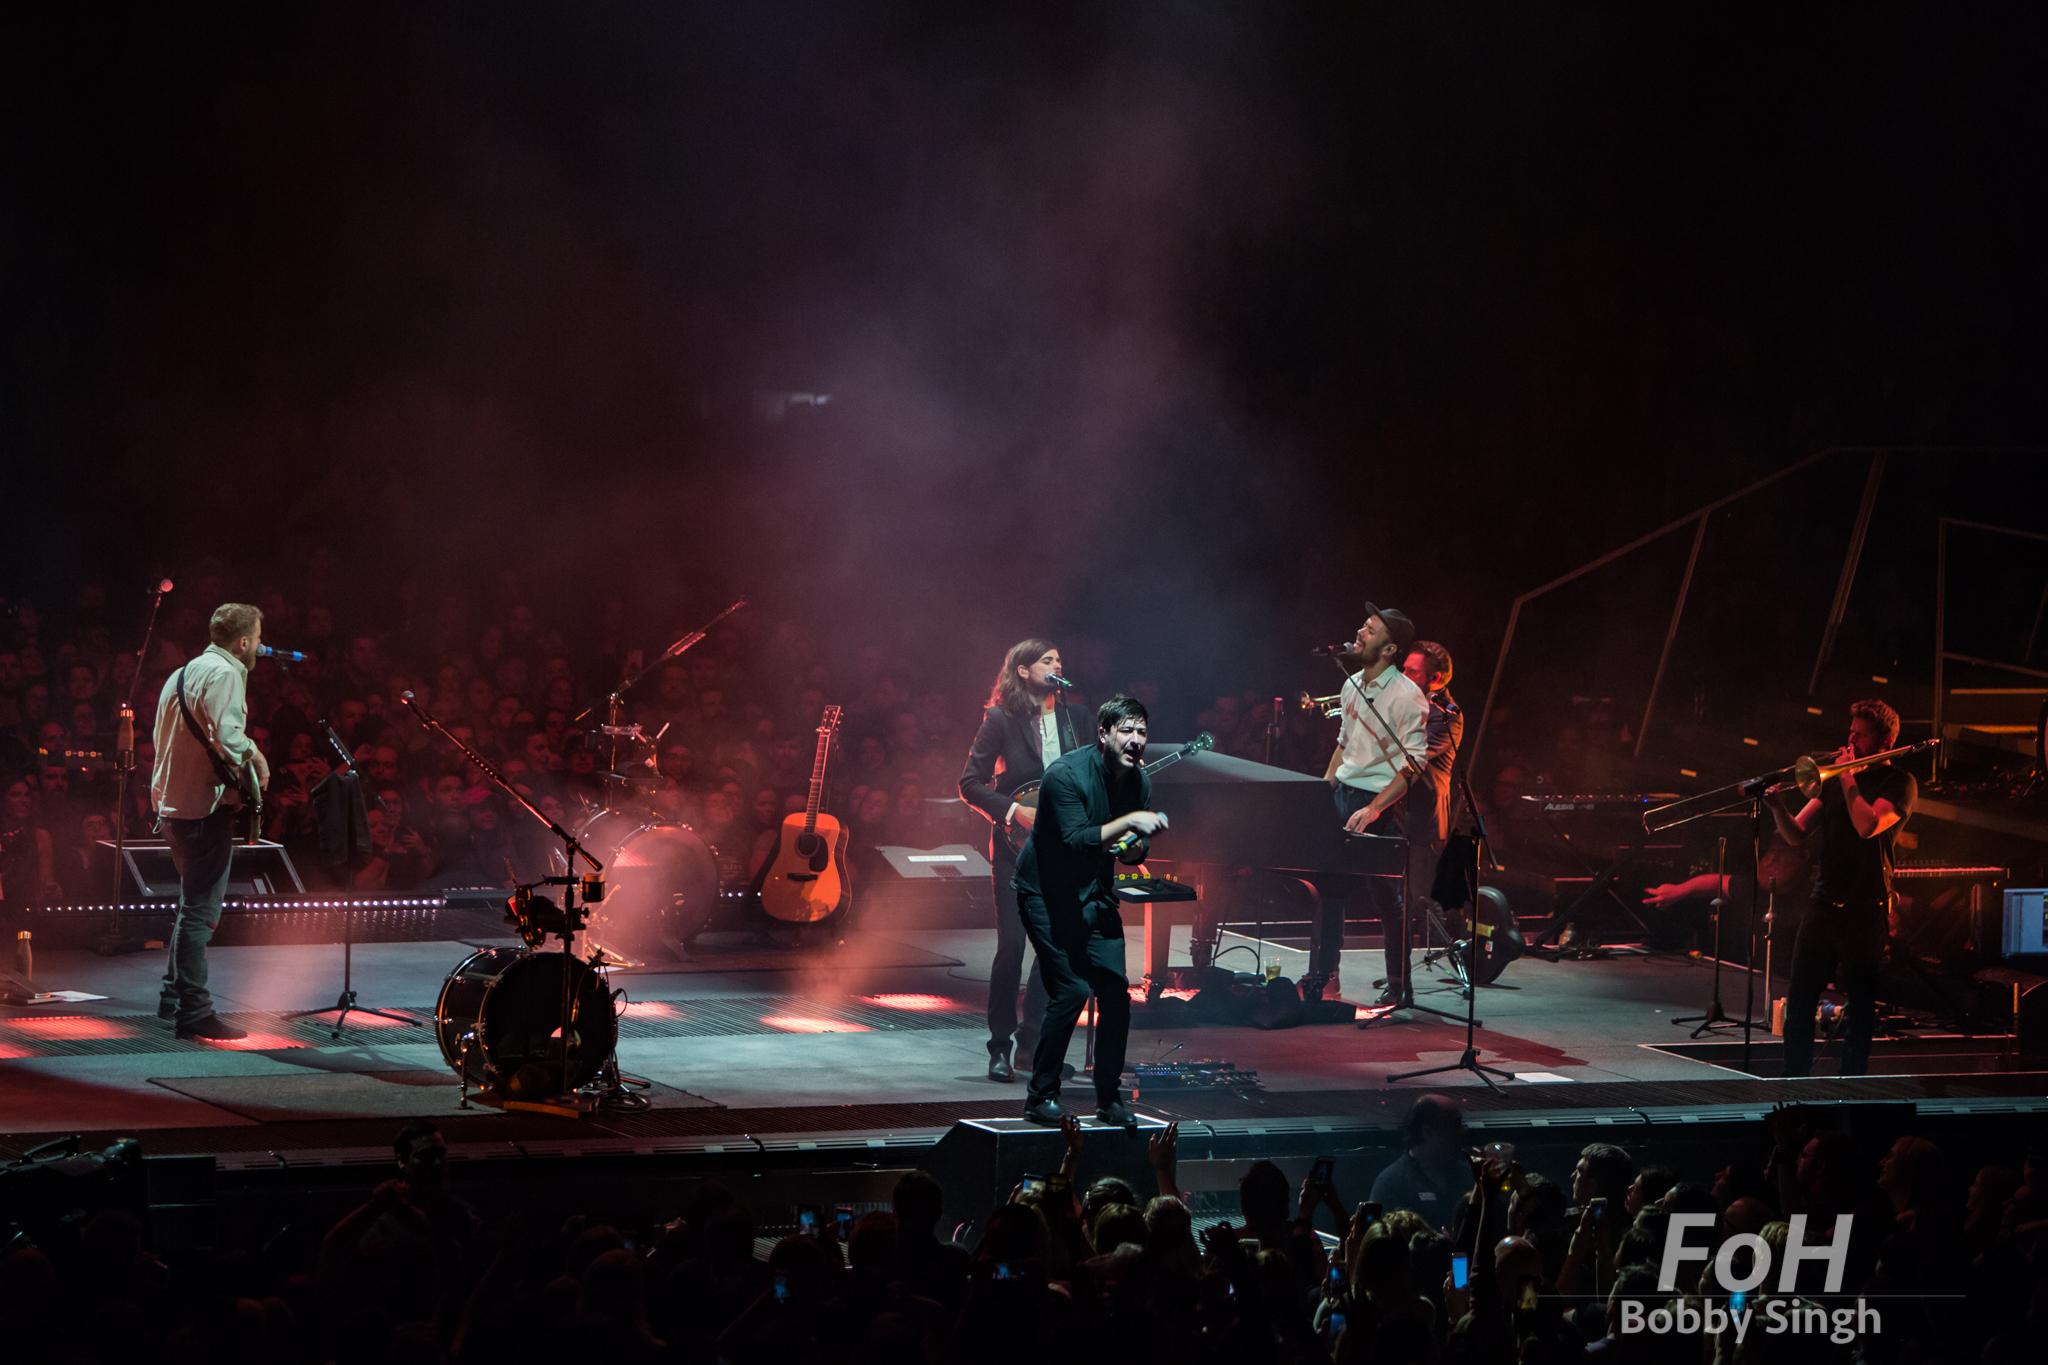 Mumford & Sons perform in Toronto. bobby Singh/@fohphoto